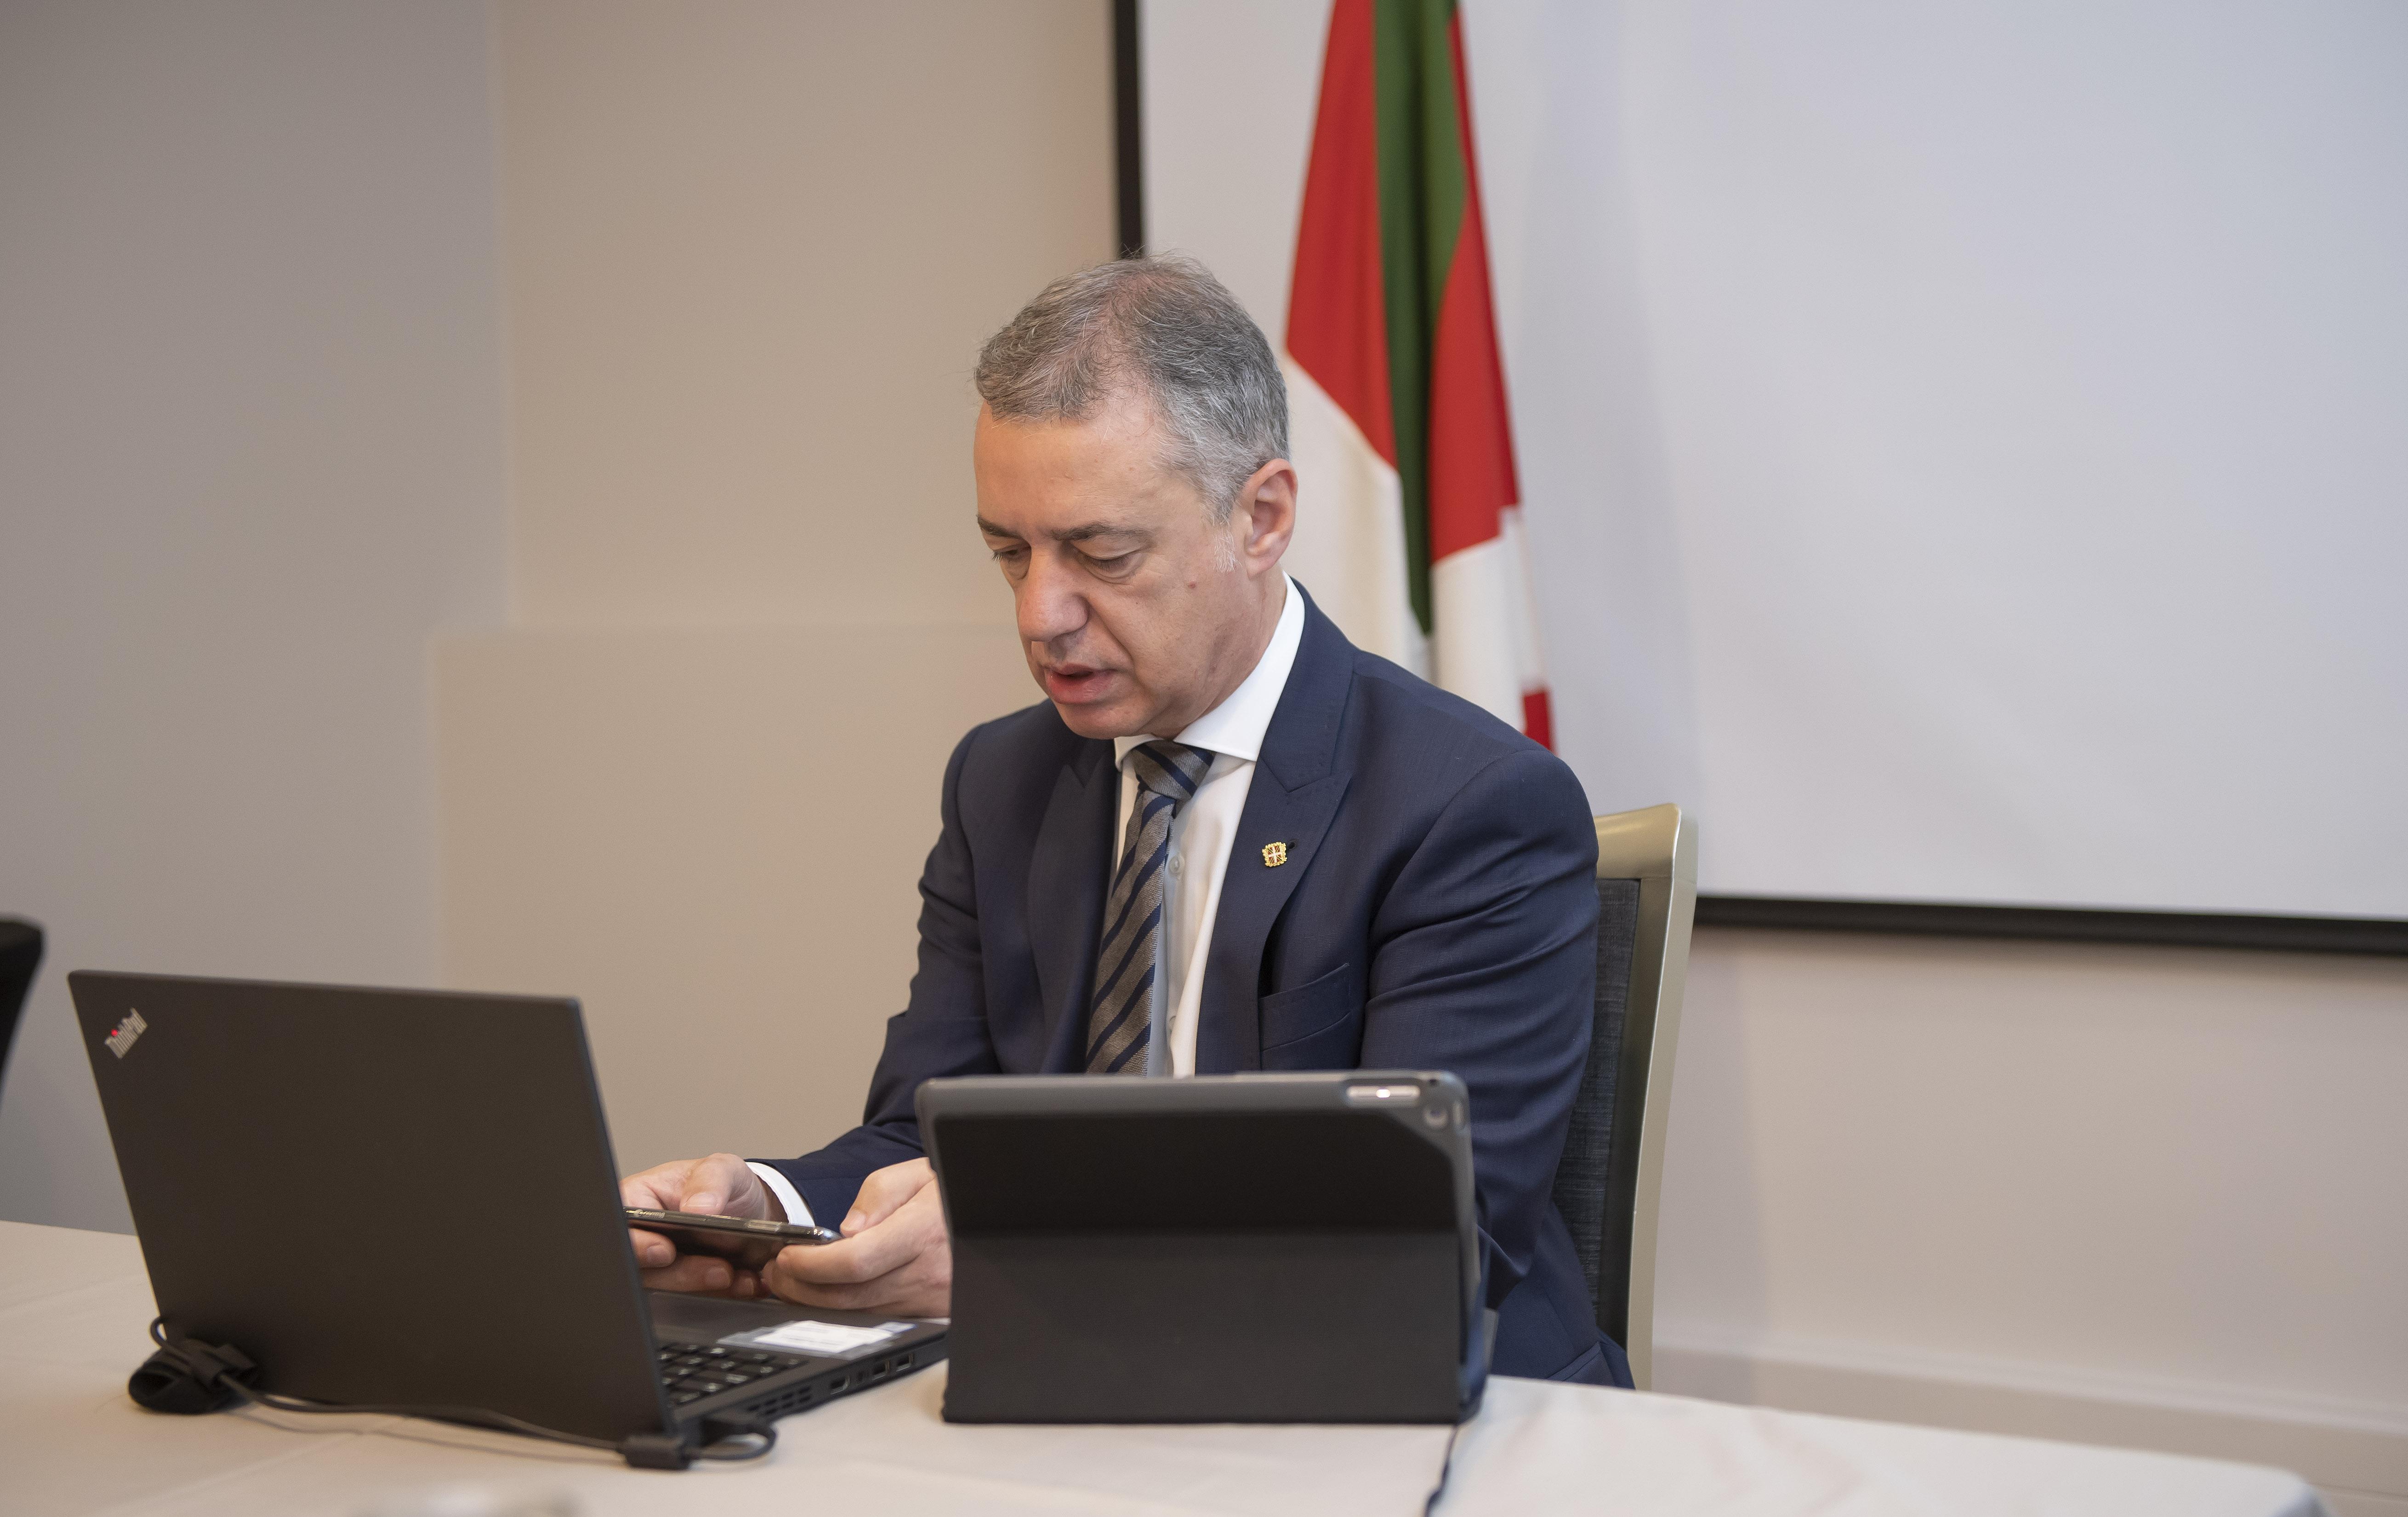 2018_11_06_lhk_consejo_gobierno_02.jpg